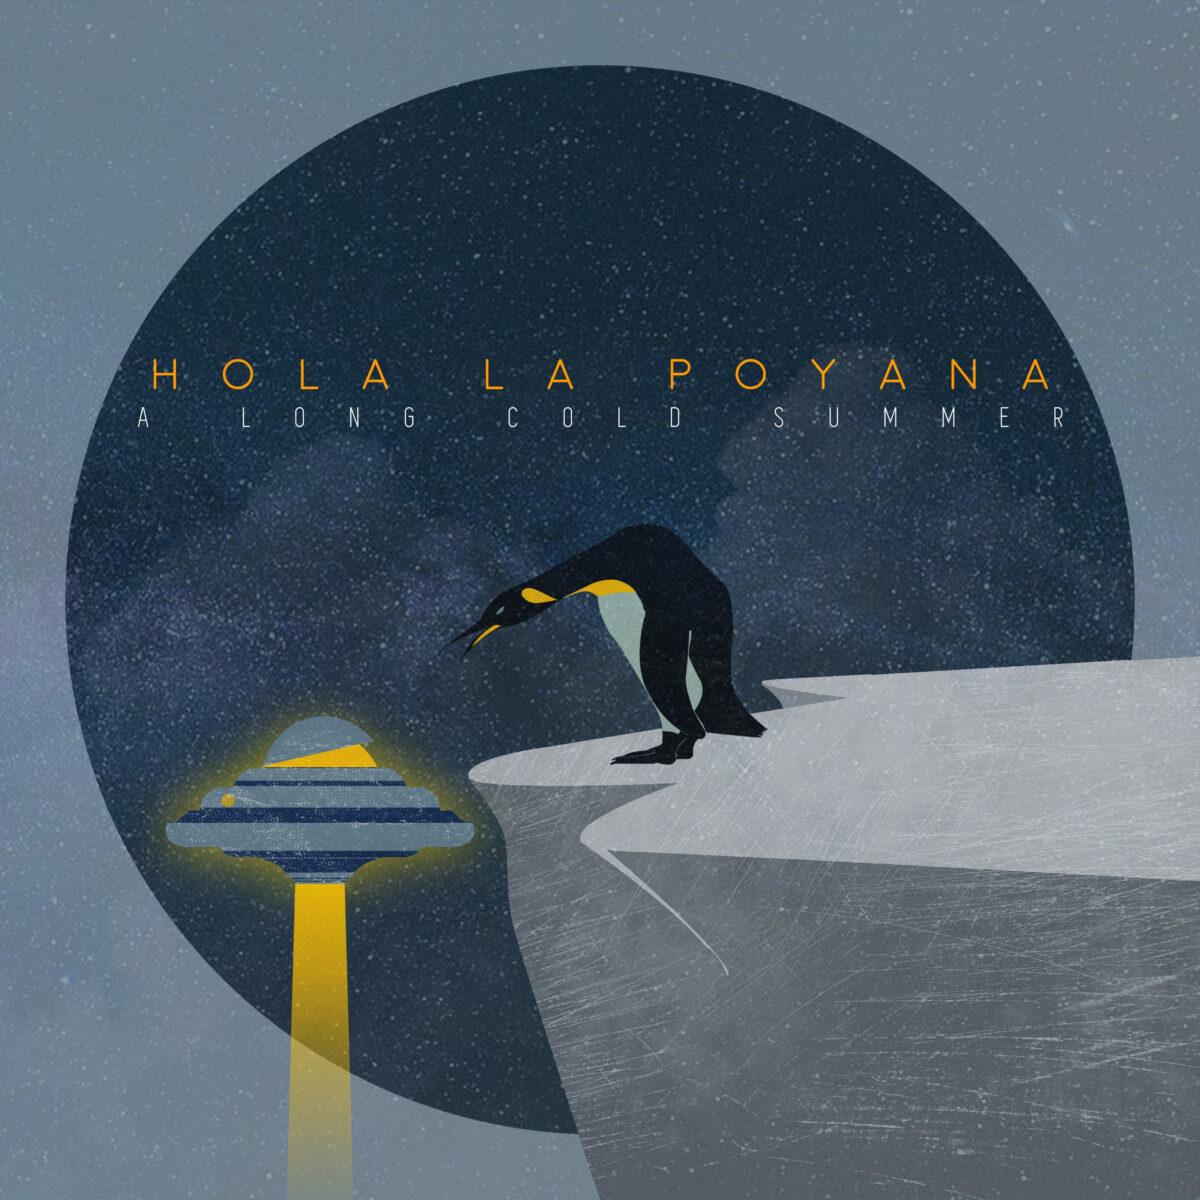 Hola La Poyana - A Long Cold Summer - Hopetone Records - Spotify - ascolti - 2020 - Sa Scena Sarda